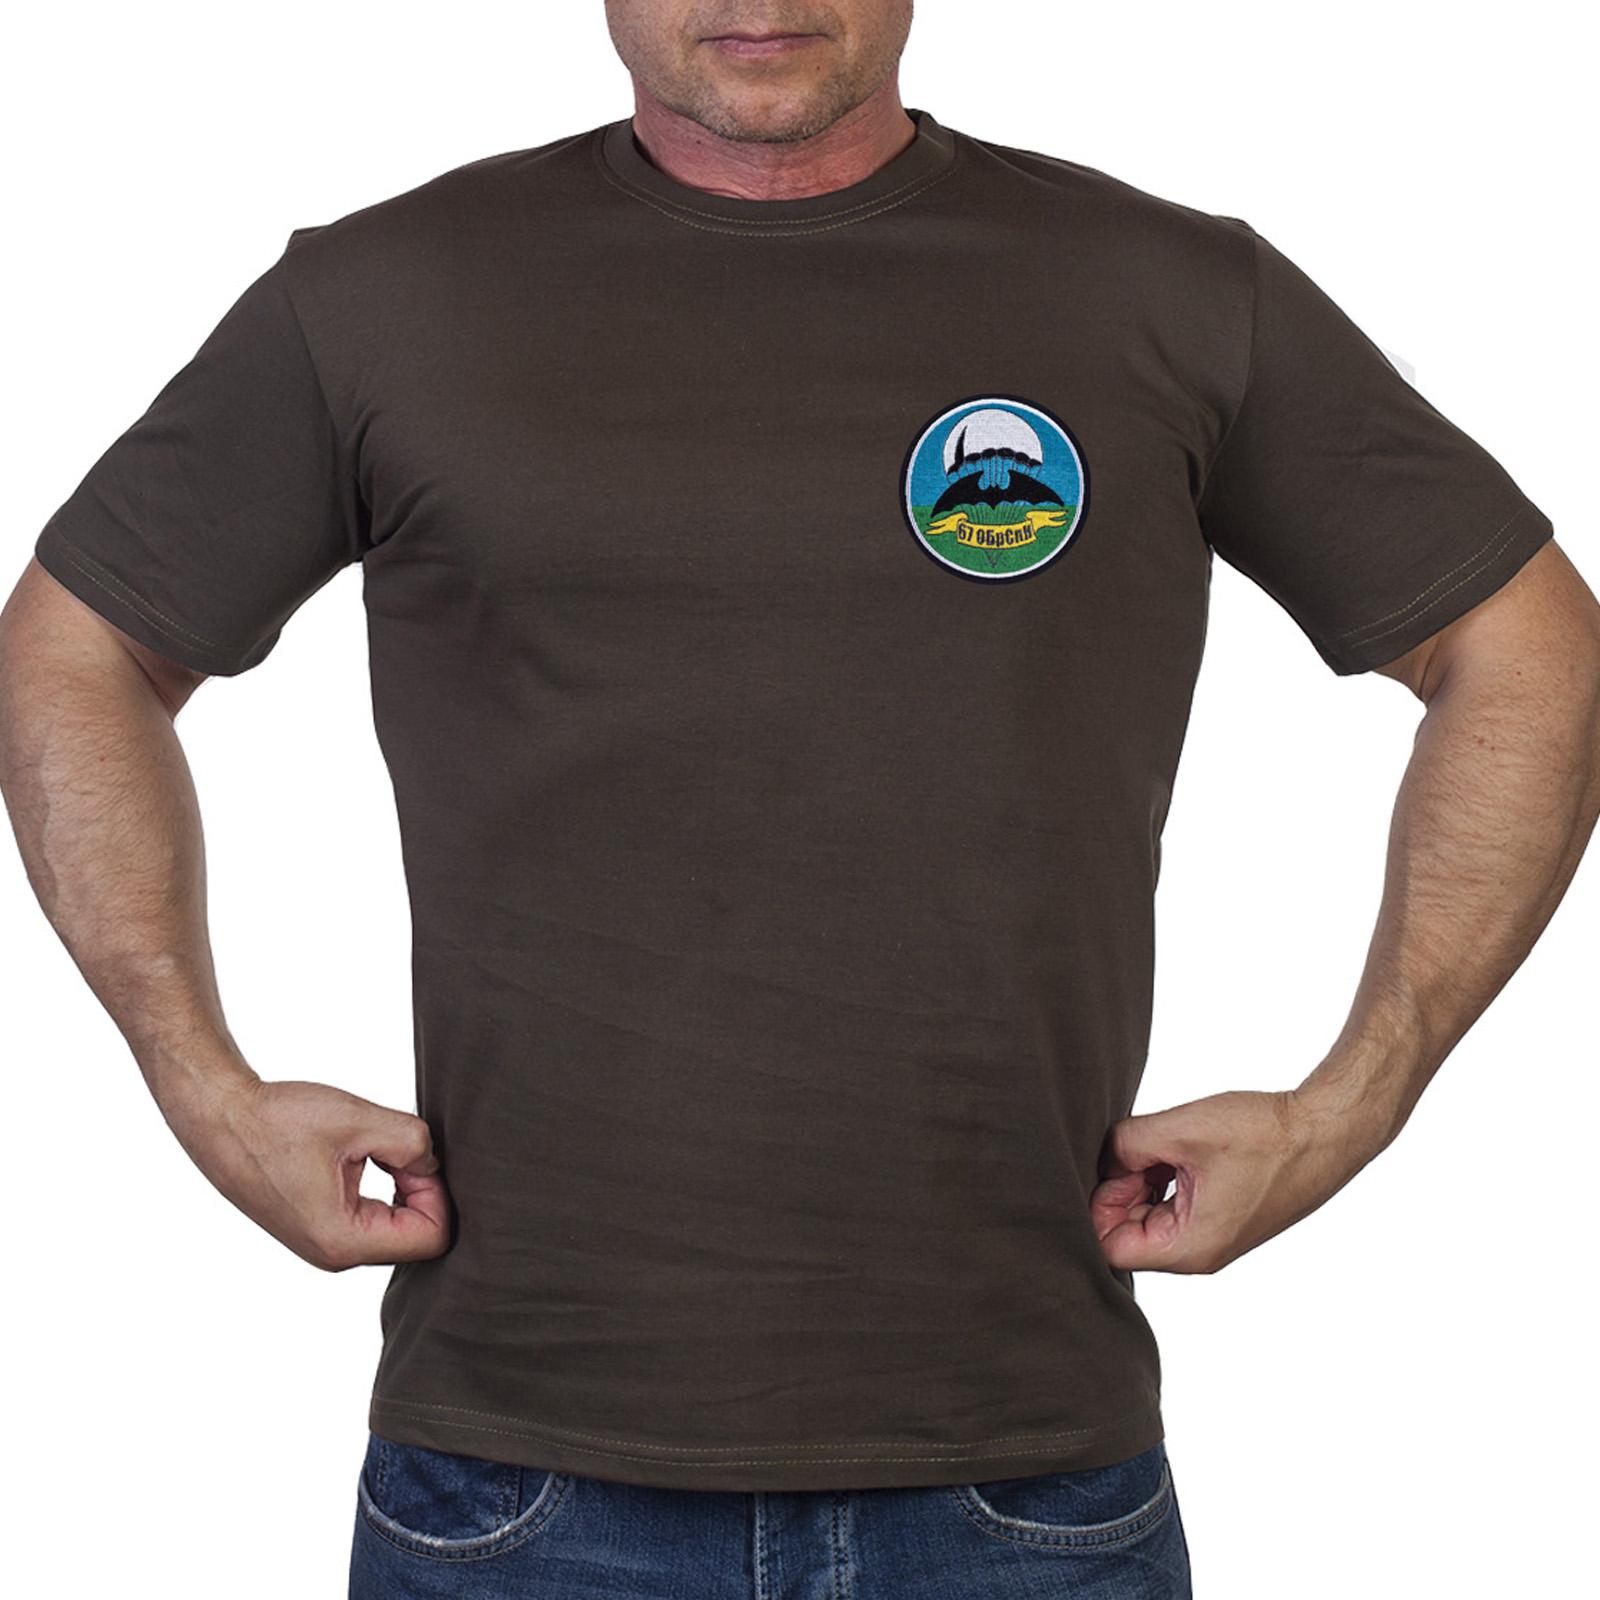 Мужская футболка 67 ОБрСпН